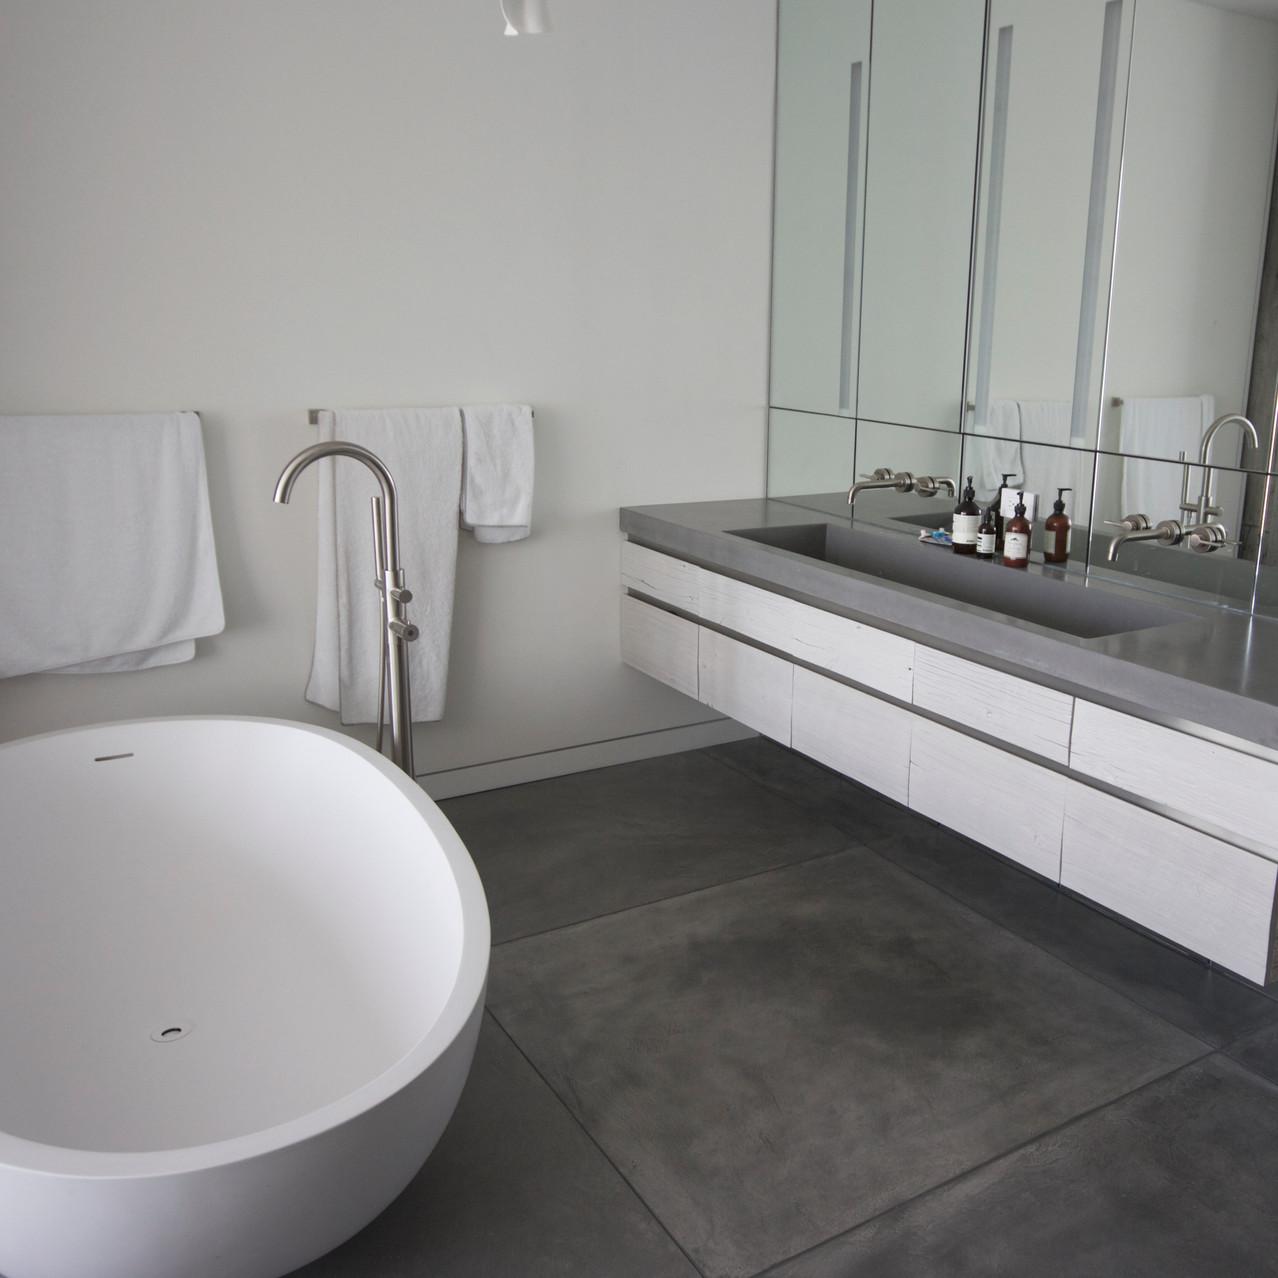 Concrete floor and sink